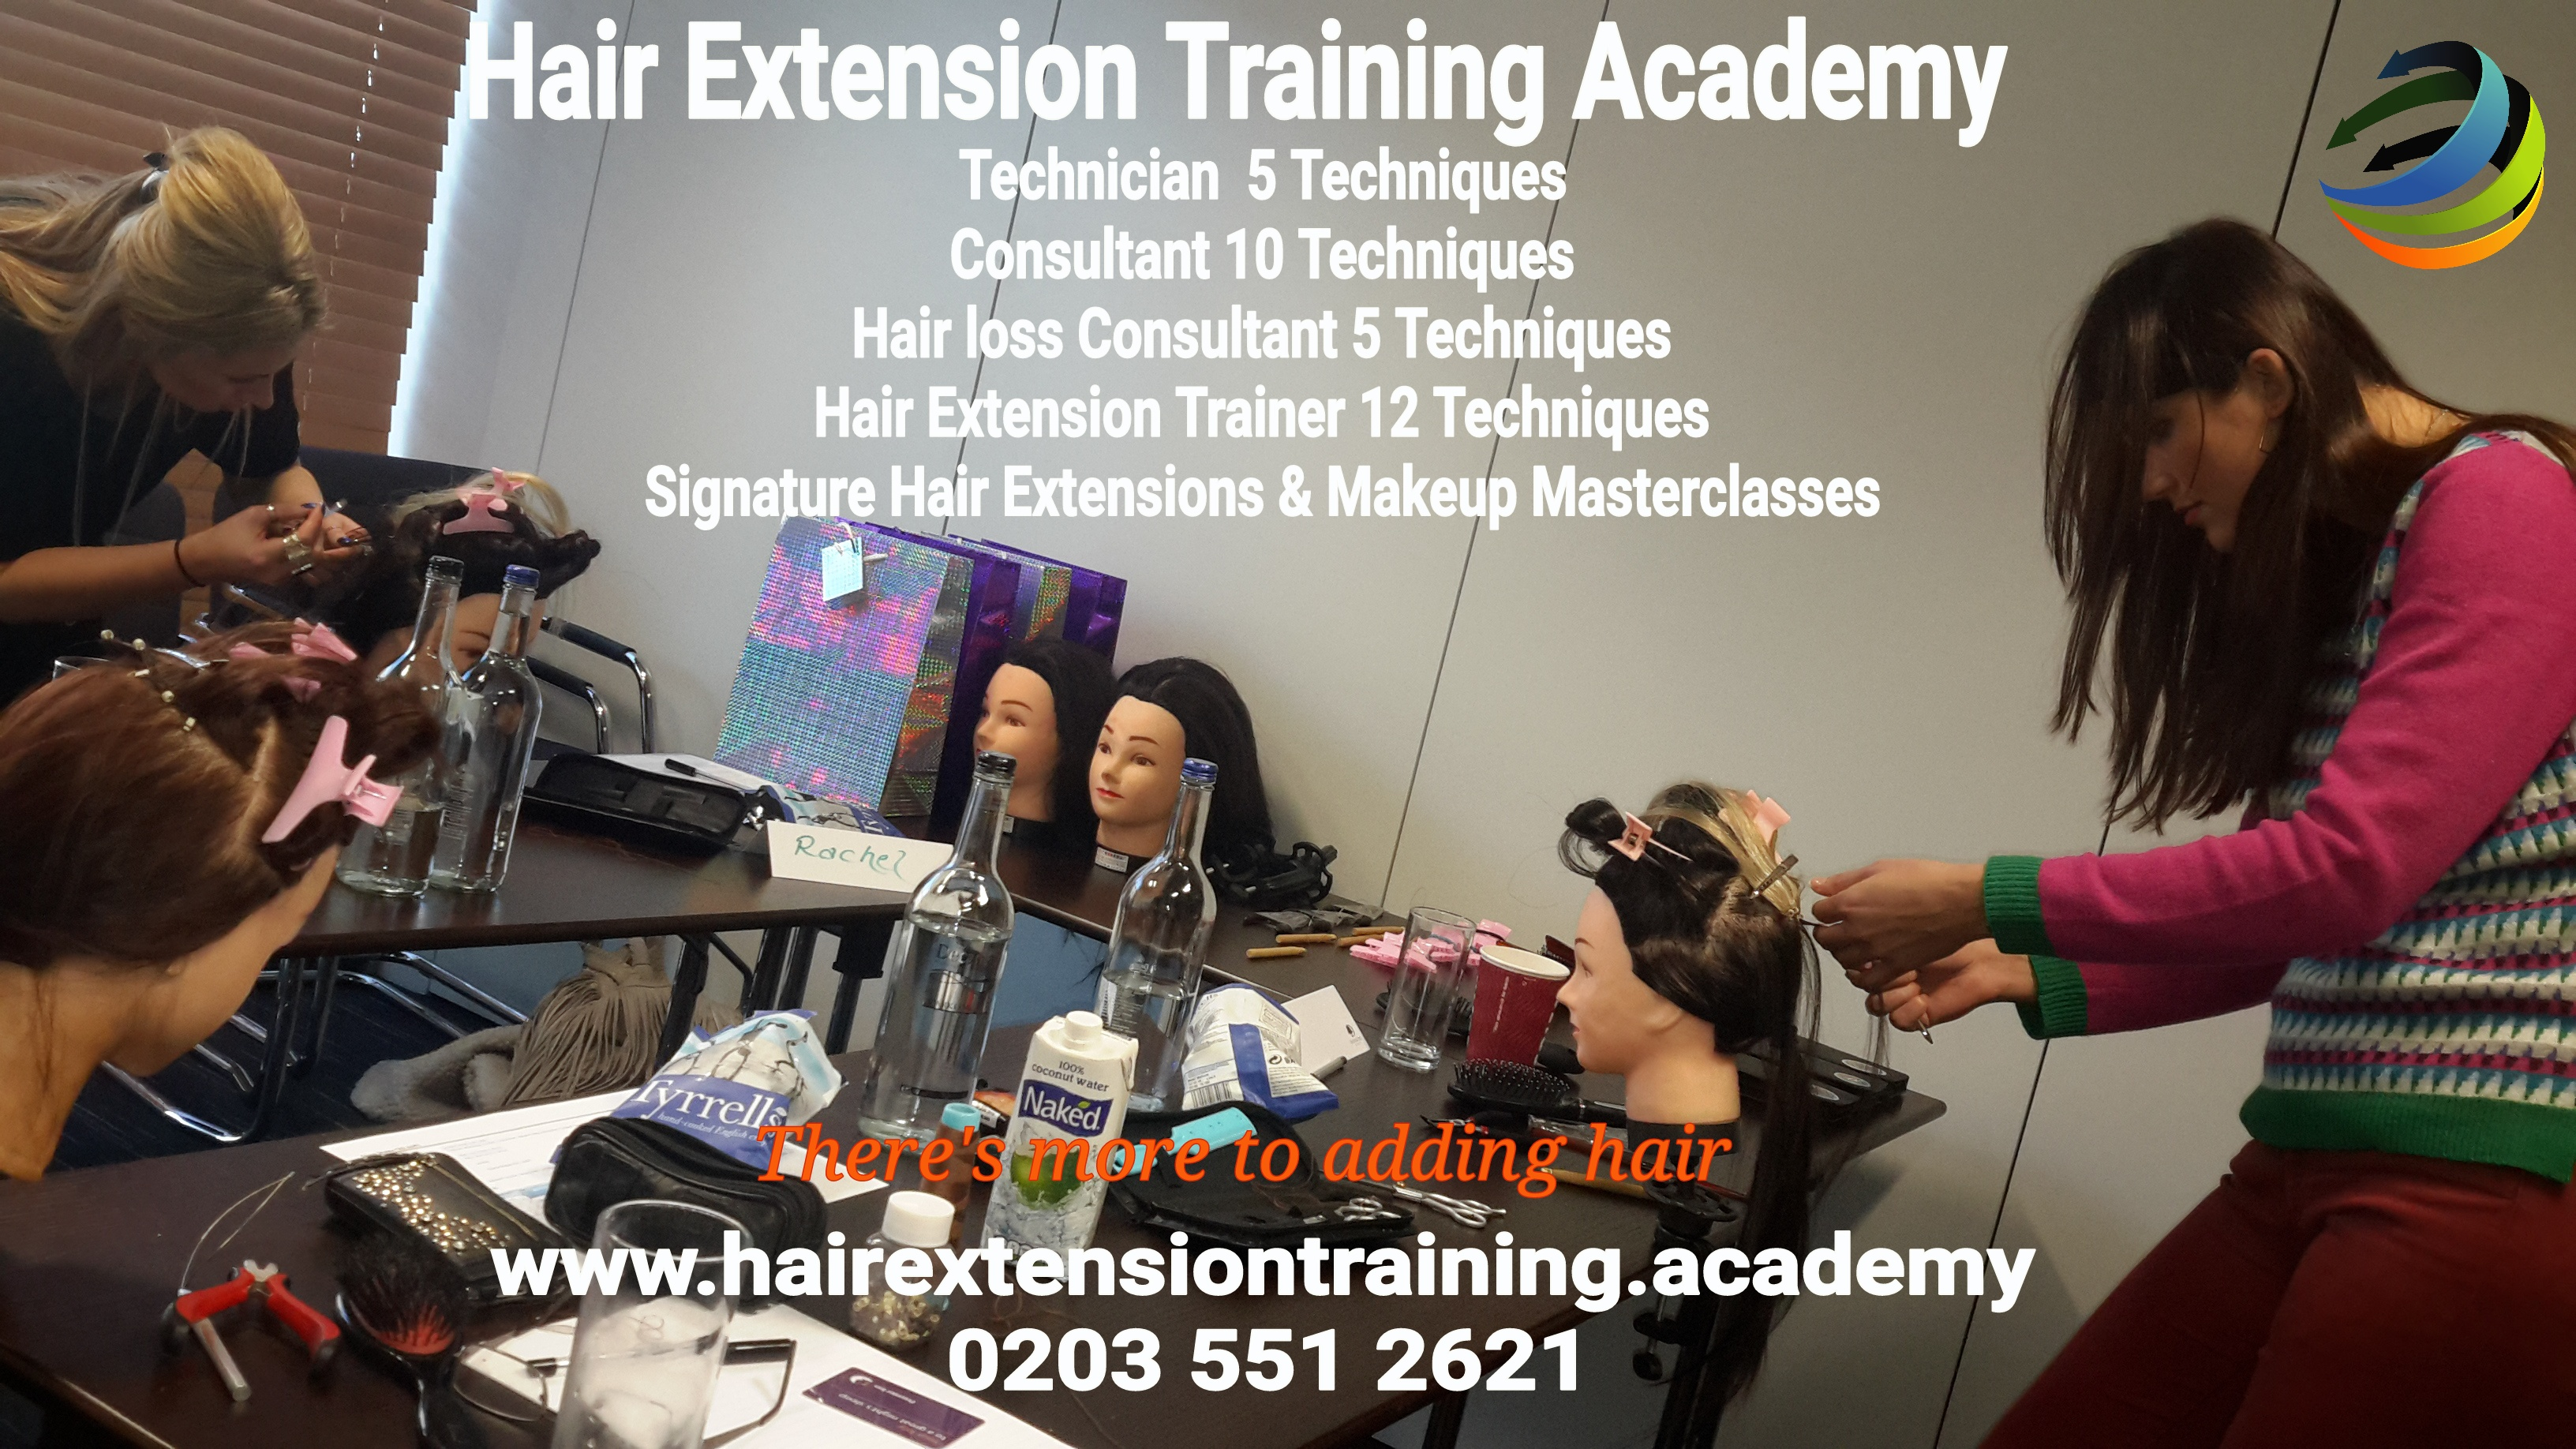 Hair extension training 16 techniques diane shawe